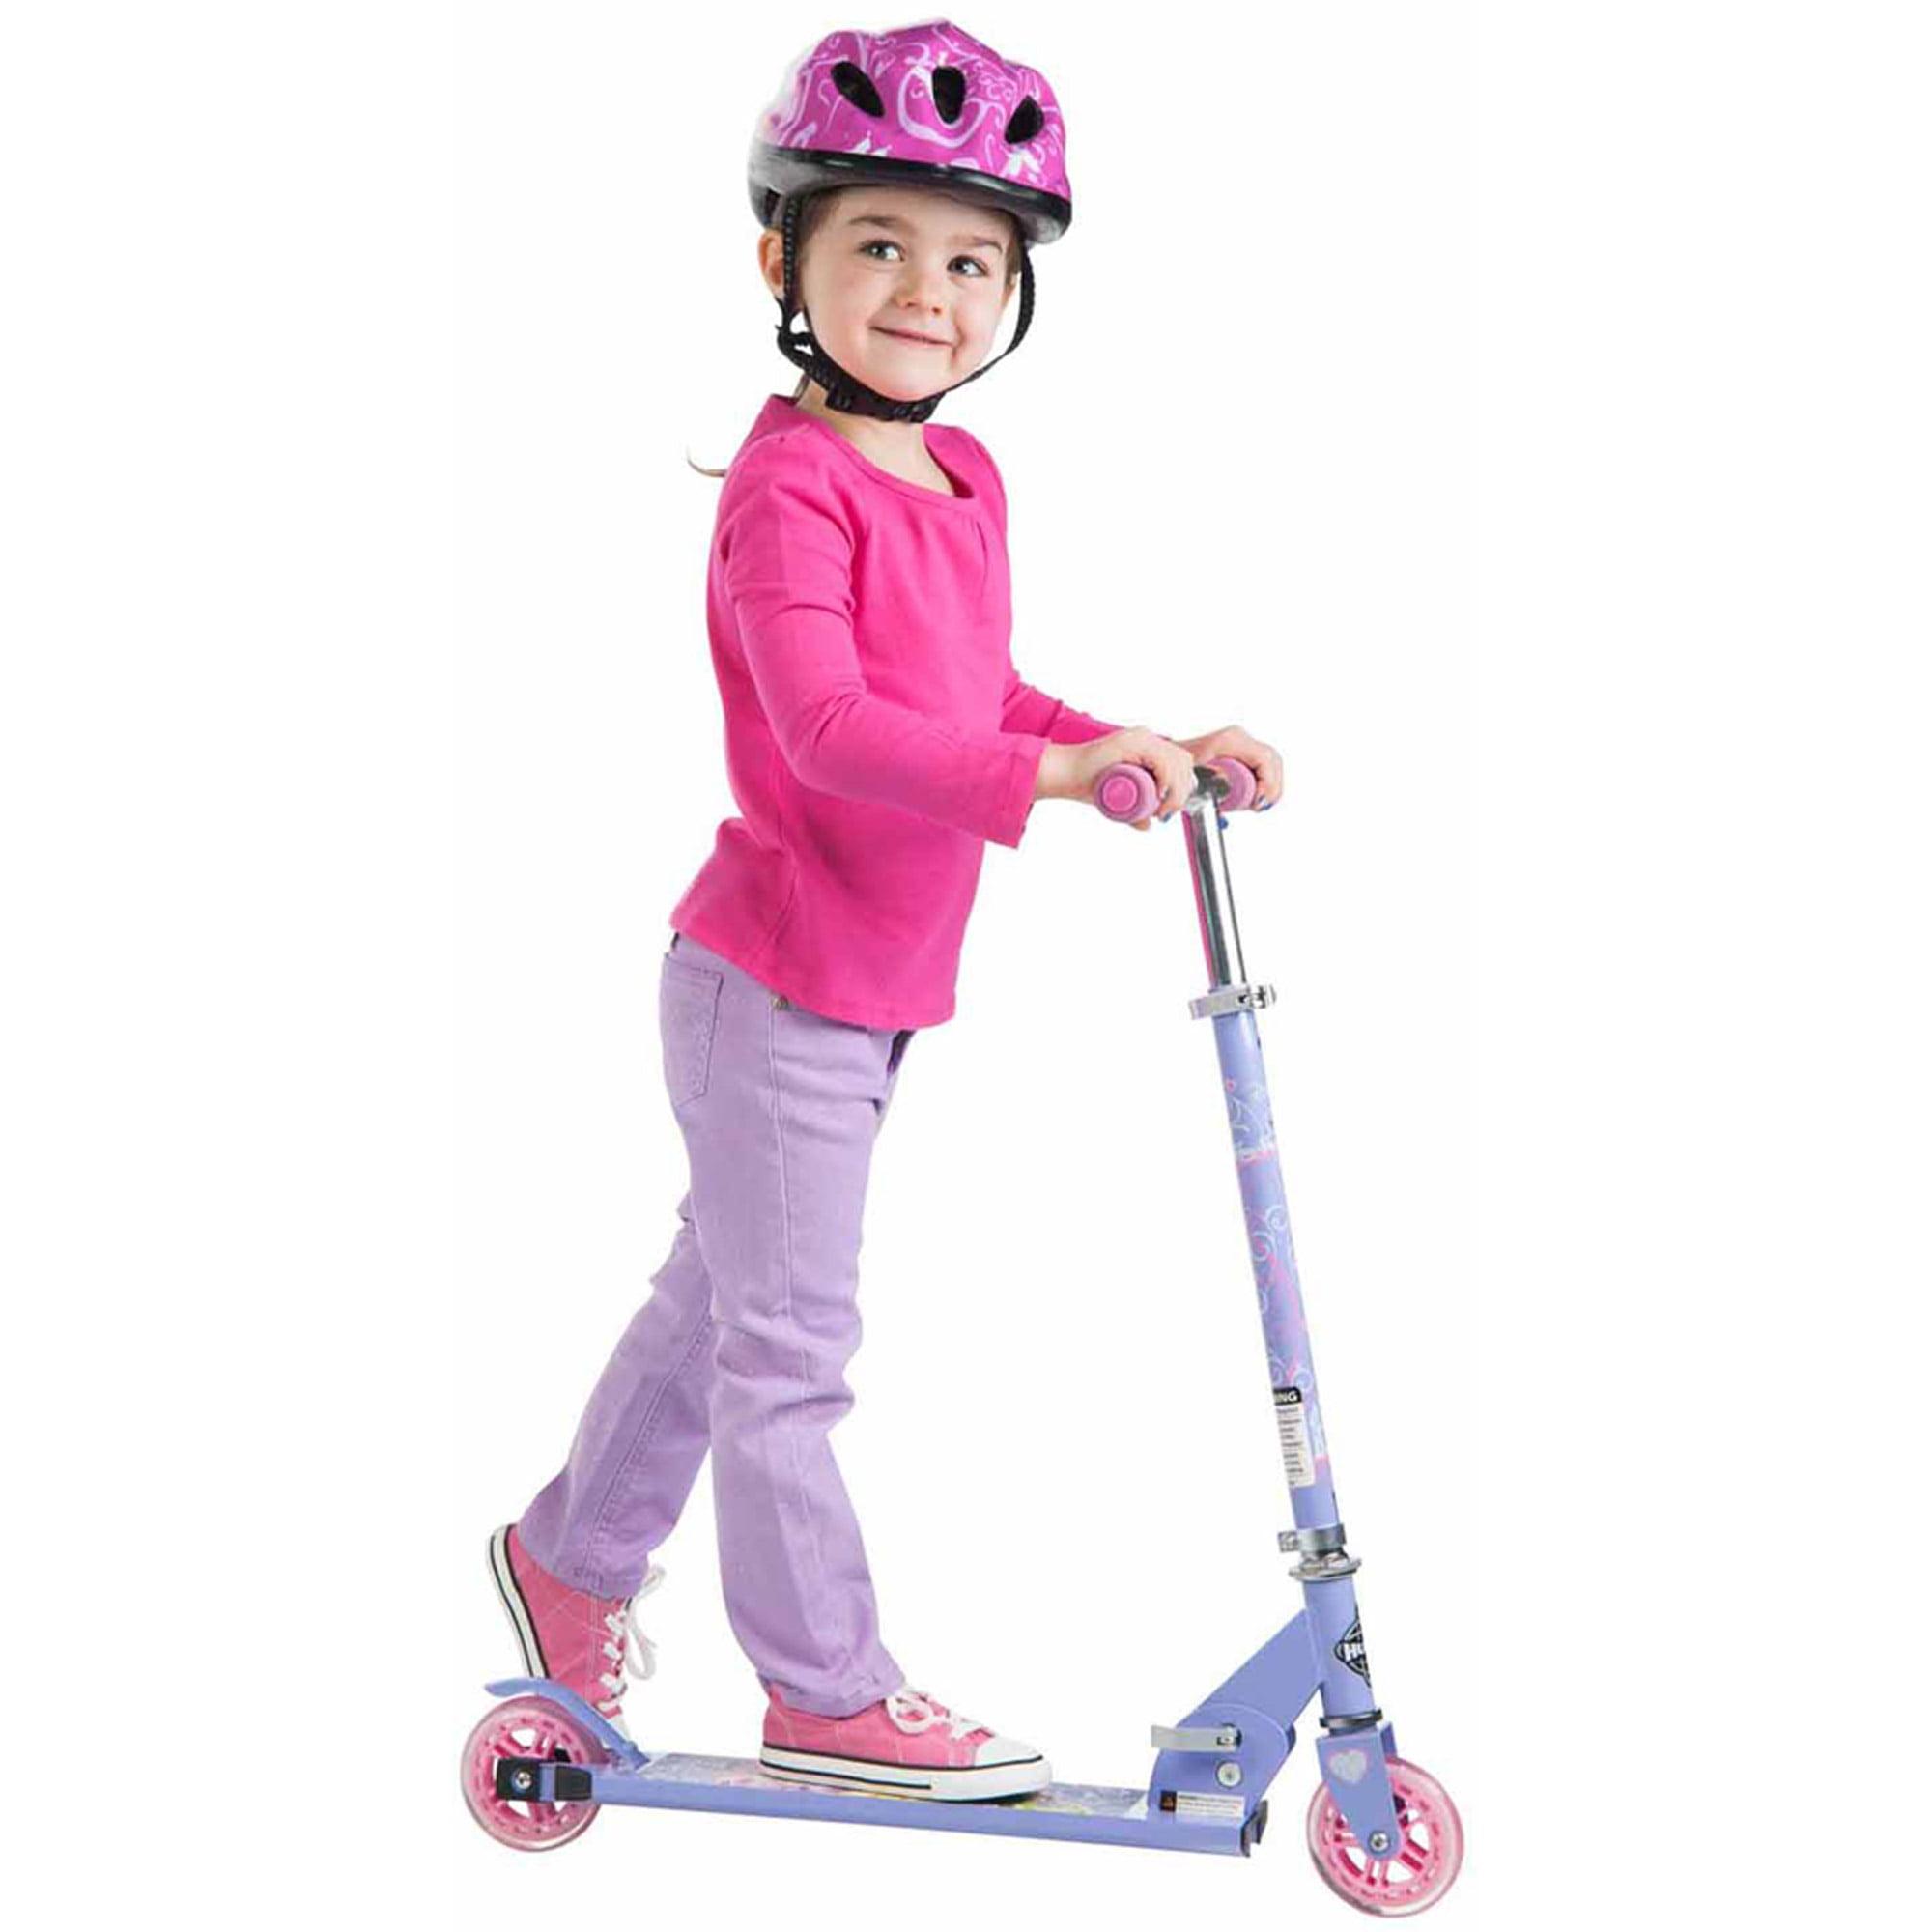 Disney Princess Huffy Inline Folding Kick Scooter, Pink